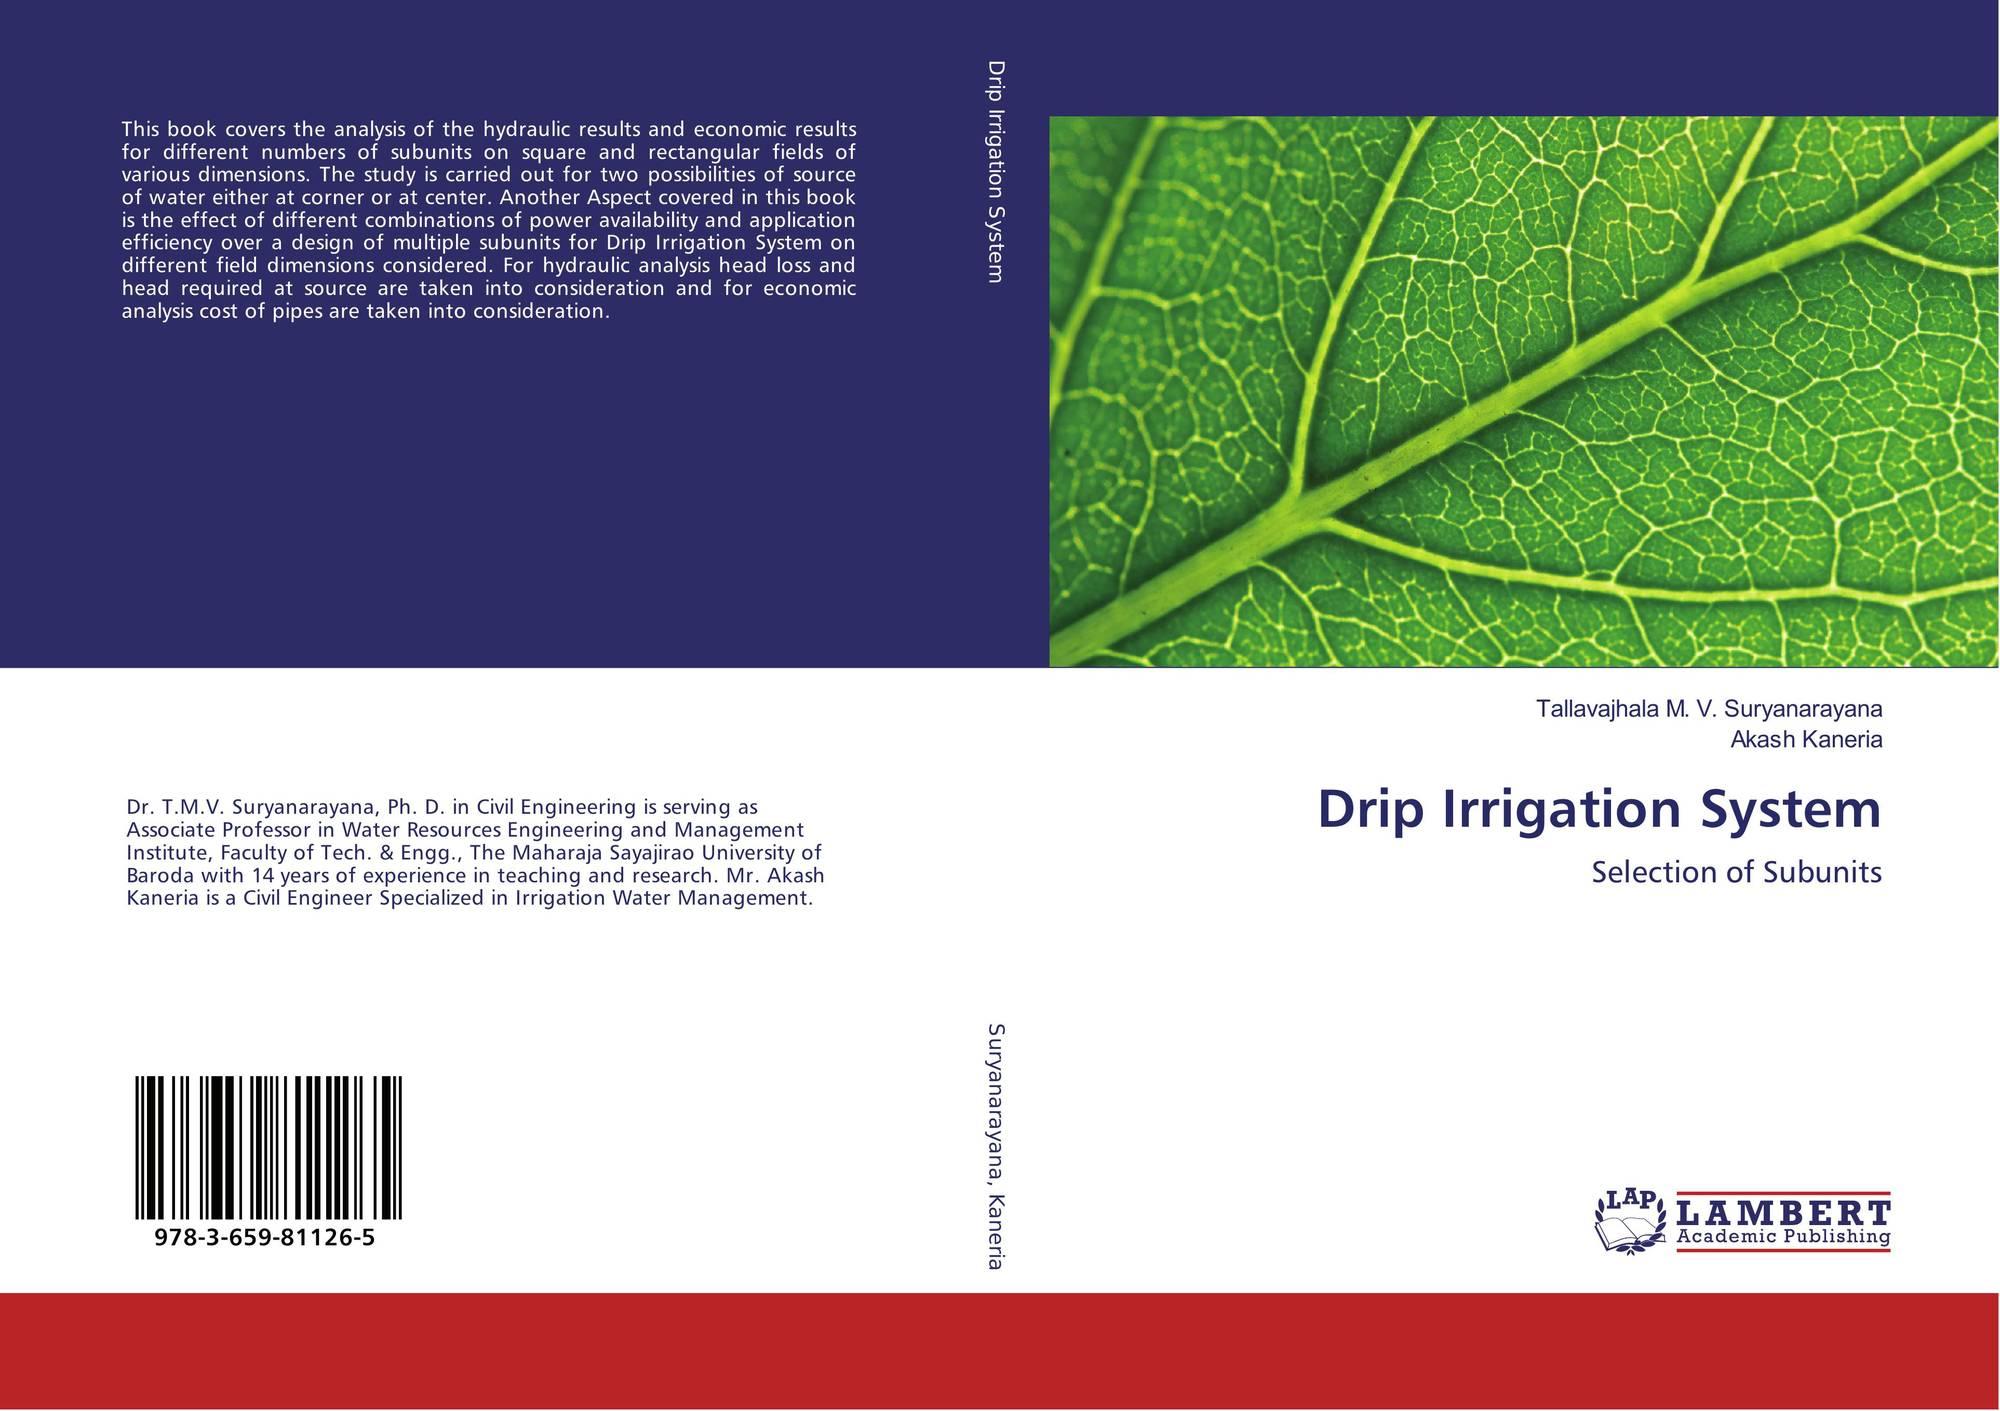 Drip Irrigation System, 978-3-659-81126-5, 3659811262